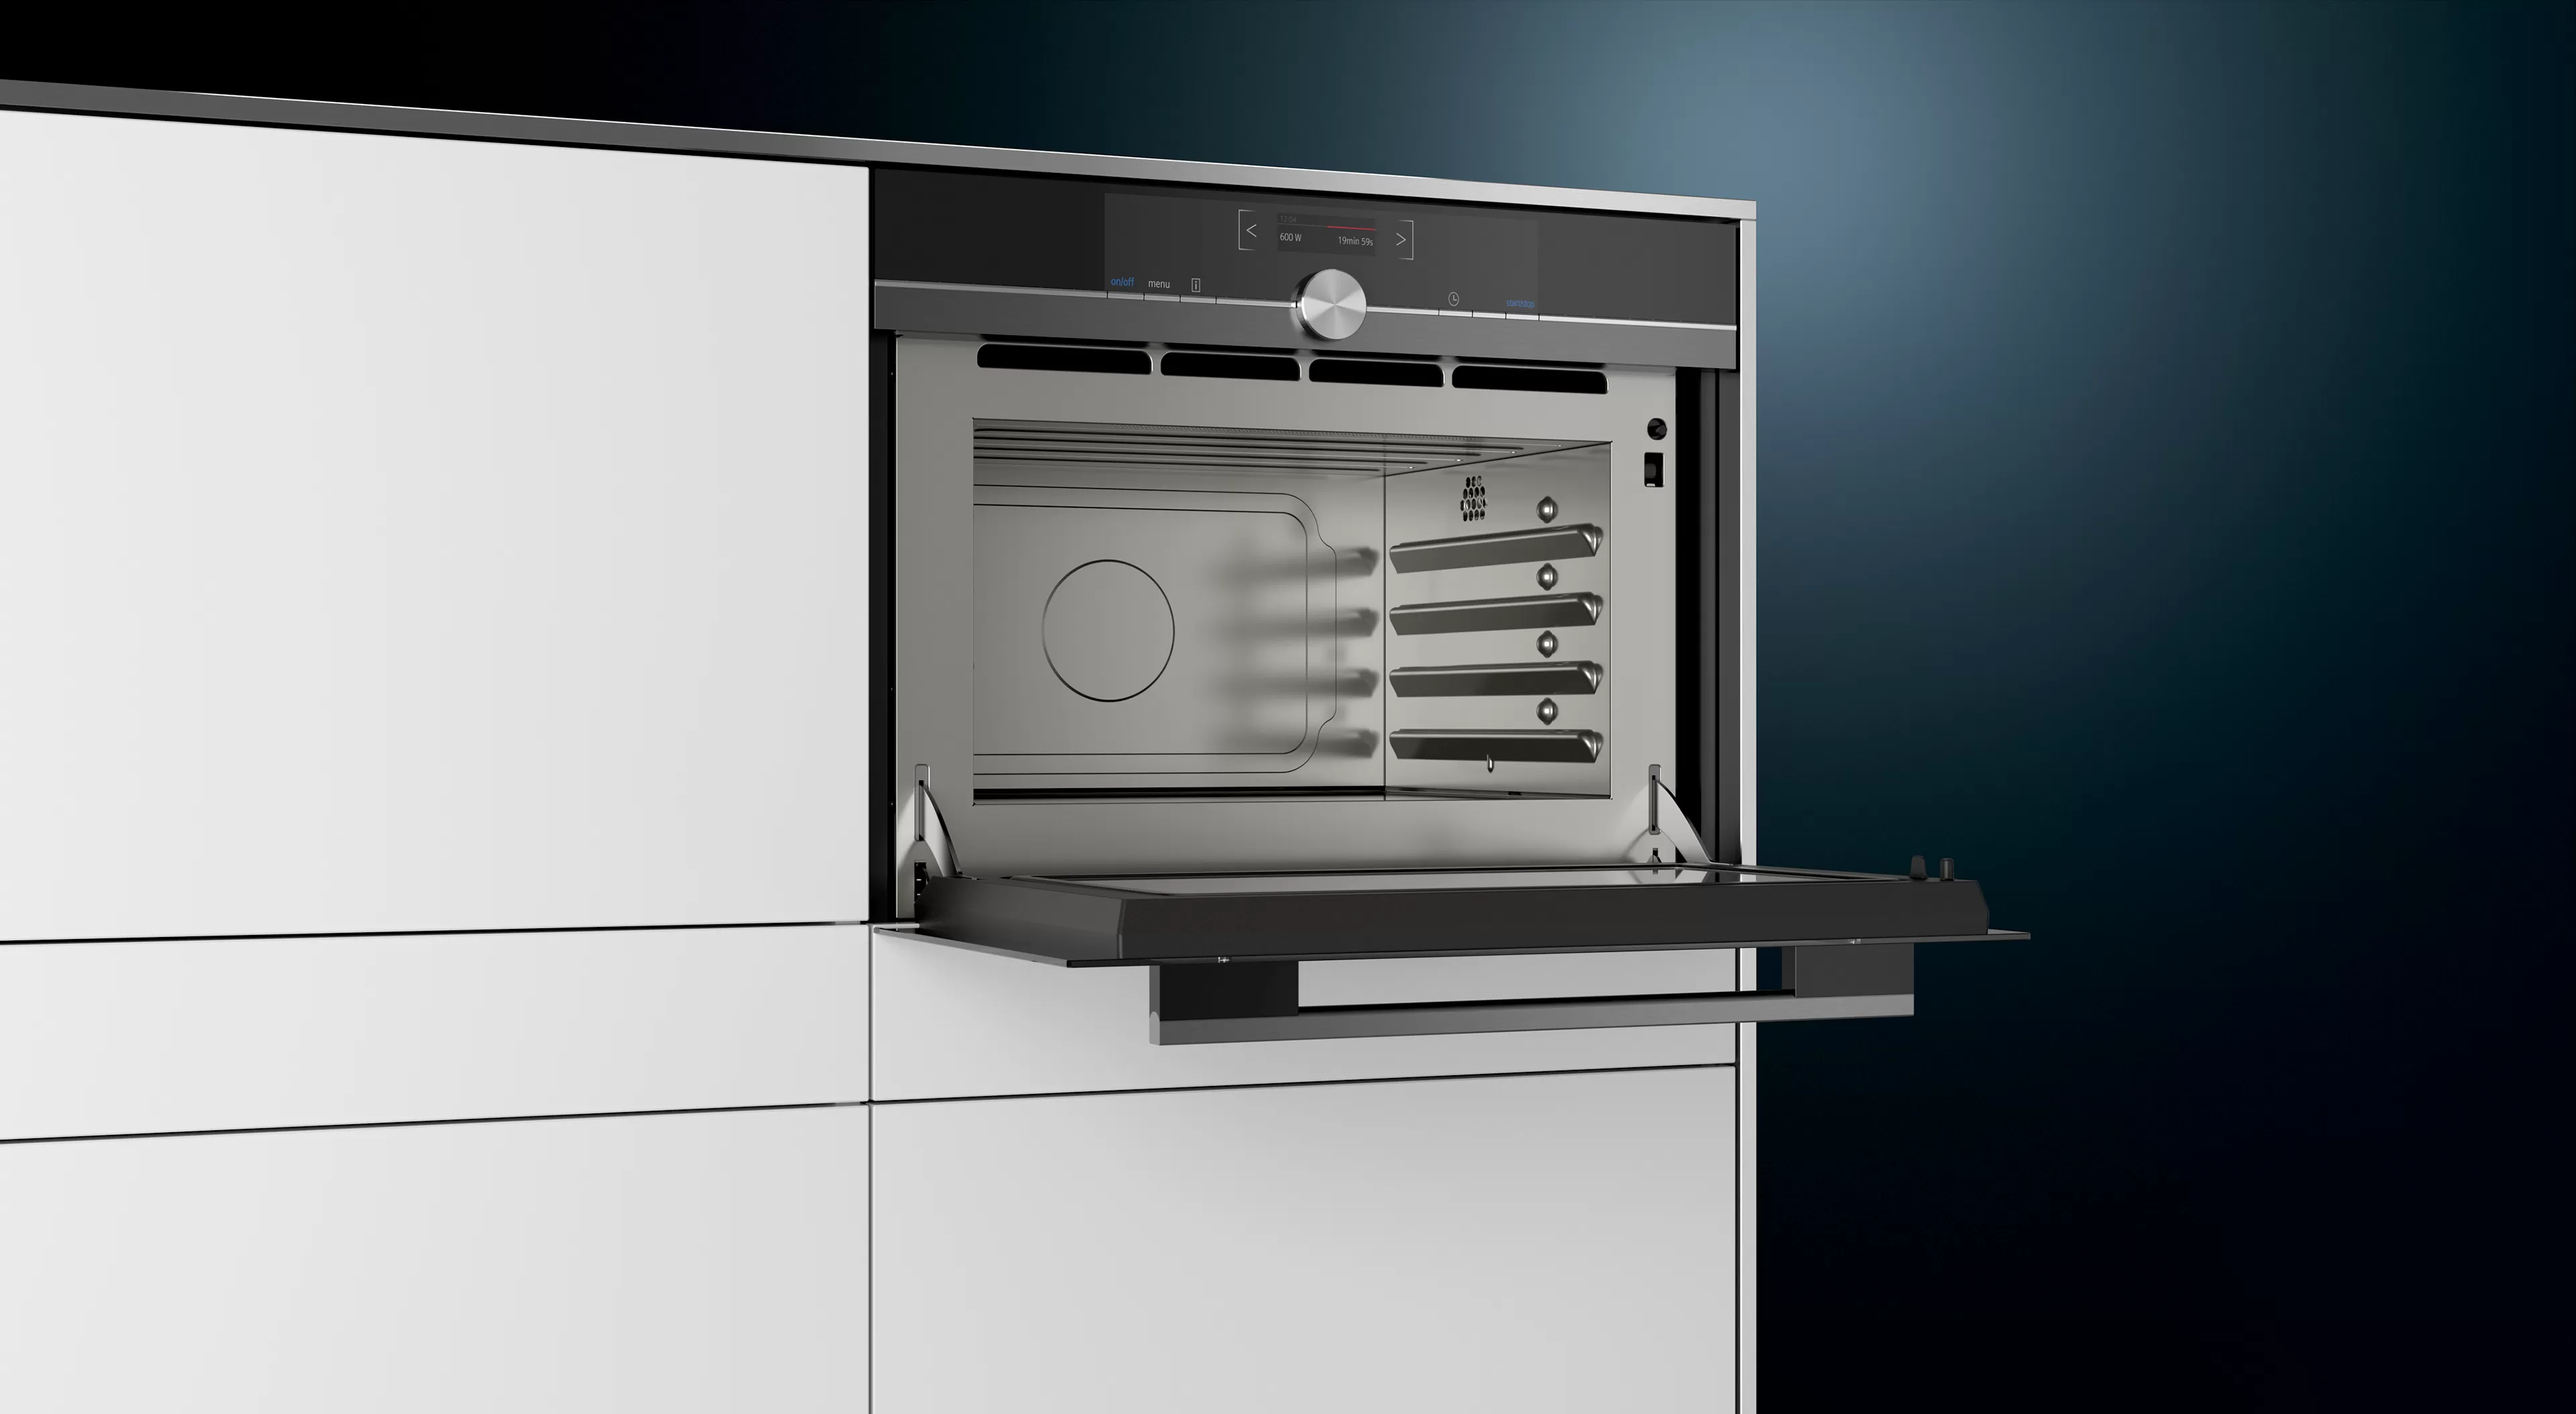 Siemens IQ700 Recessed Microwave